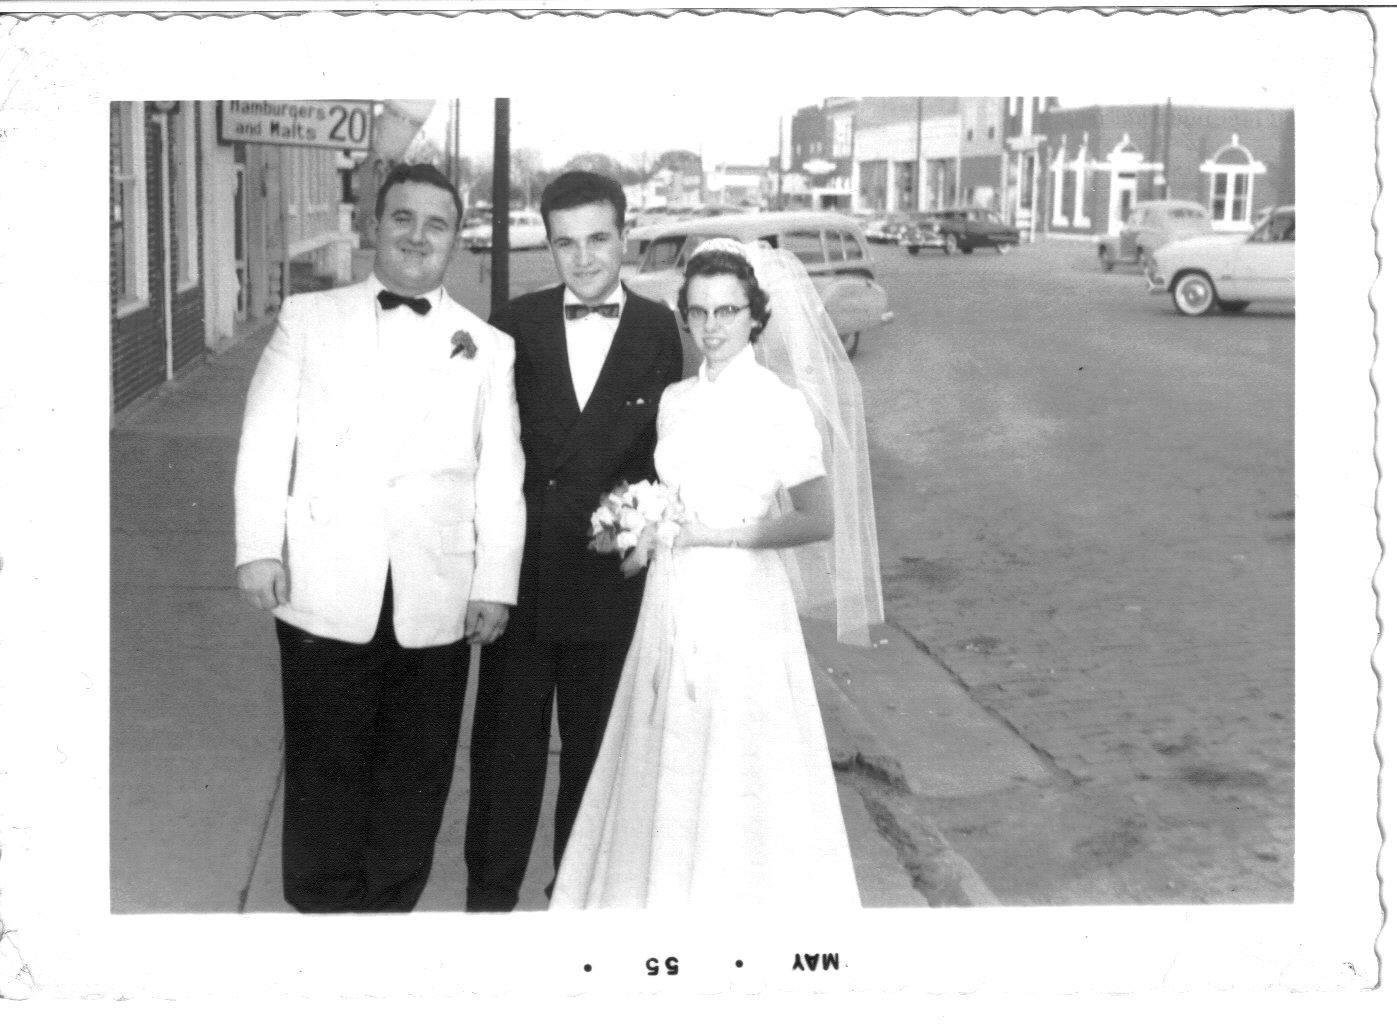 cj mcghee and floyd wedding -street scene